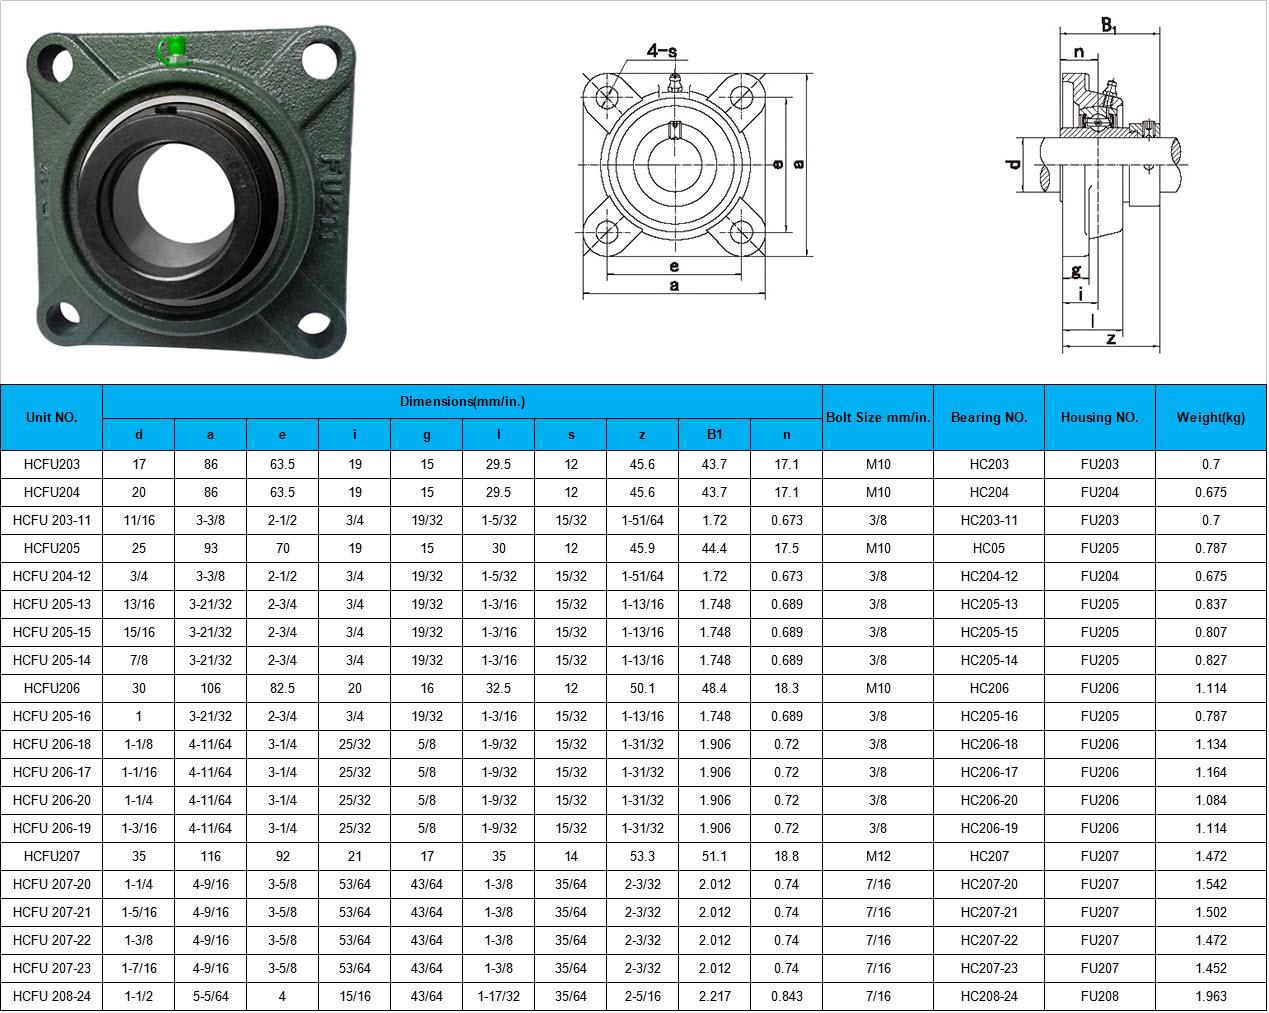 HCFU203 | HCFU204 | HCFU 203-11 | HCFU205 | HCFU 204-12 | HCFU 205-13 | HCFU 205-15 | HCFU 205-14 | HCFU206 | HCFU 205-16 | HCFU 206-18 | HCFU 206-17 | HCFU 206-20 | HCFU 206-19 | HCFU207 | HCFU 207-20 | HCFU 207-21 | HCFU 207-22 | HCFU 207-23 | HCFU 208-24